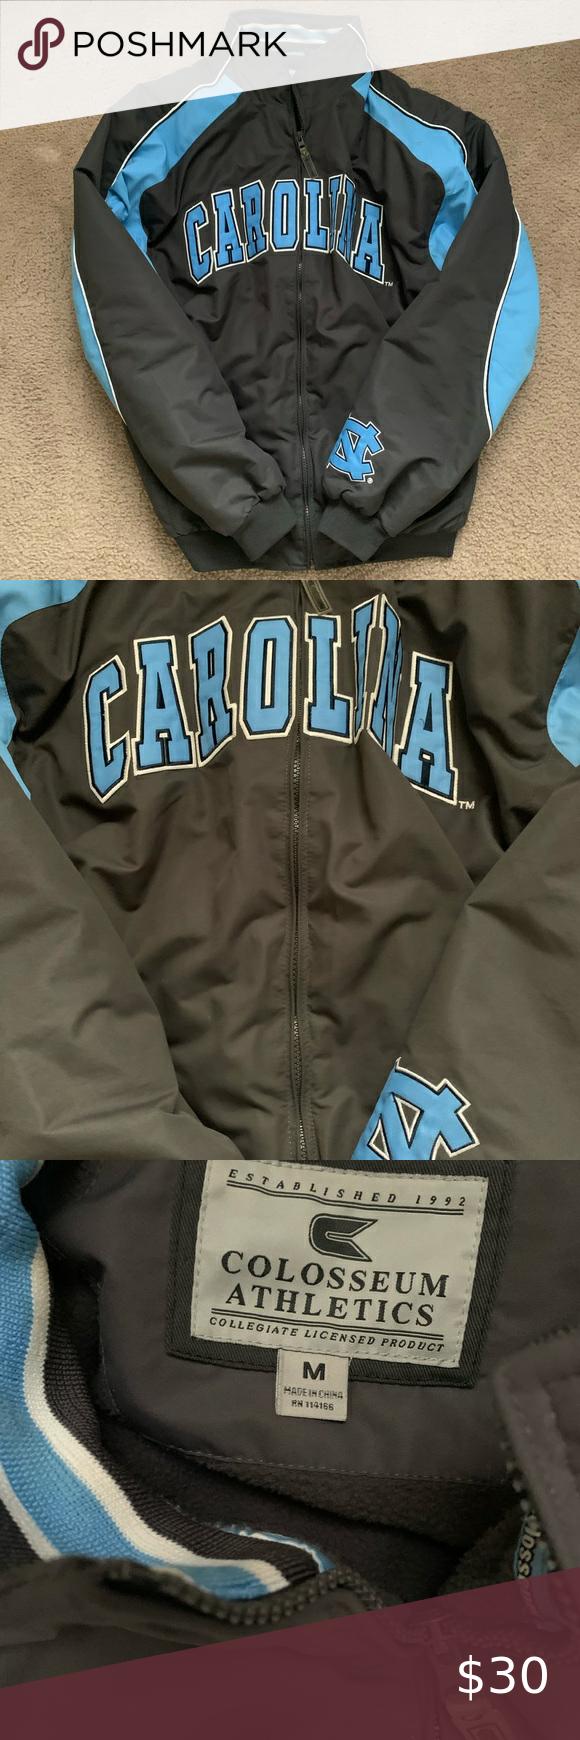 North Carolina Tar Heel Jacket North Carolina Tar Heels Jackets Tar Heels [ 1740 x 580 Pixel ]